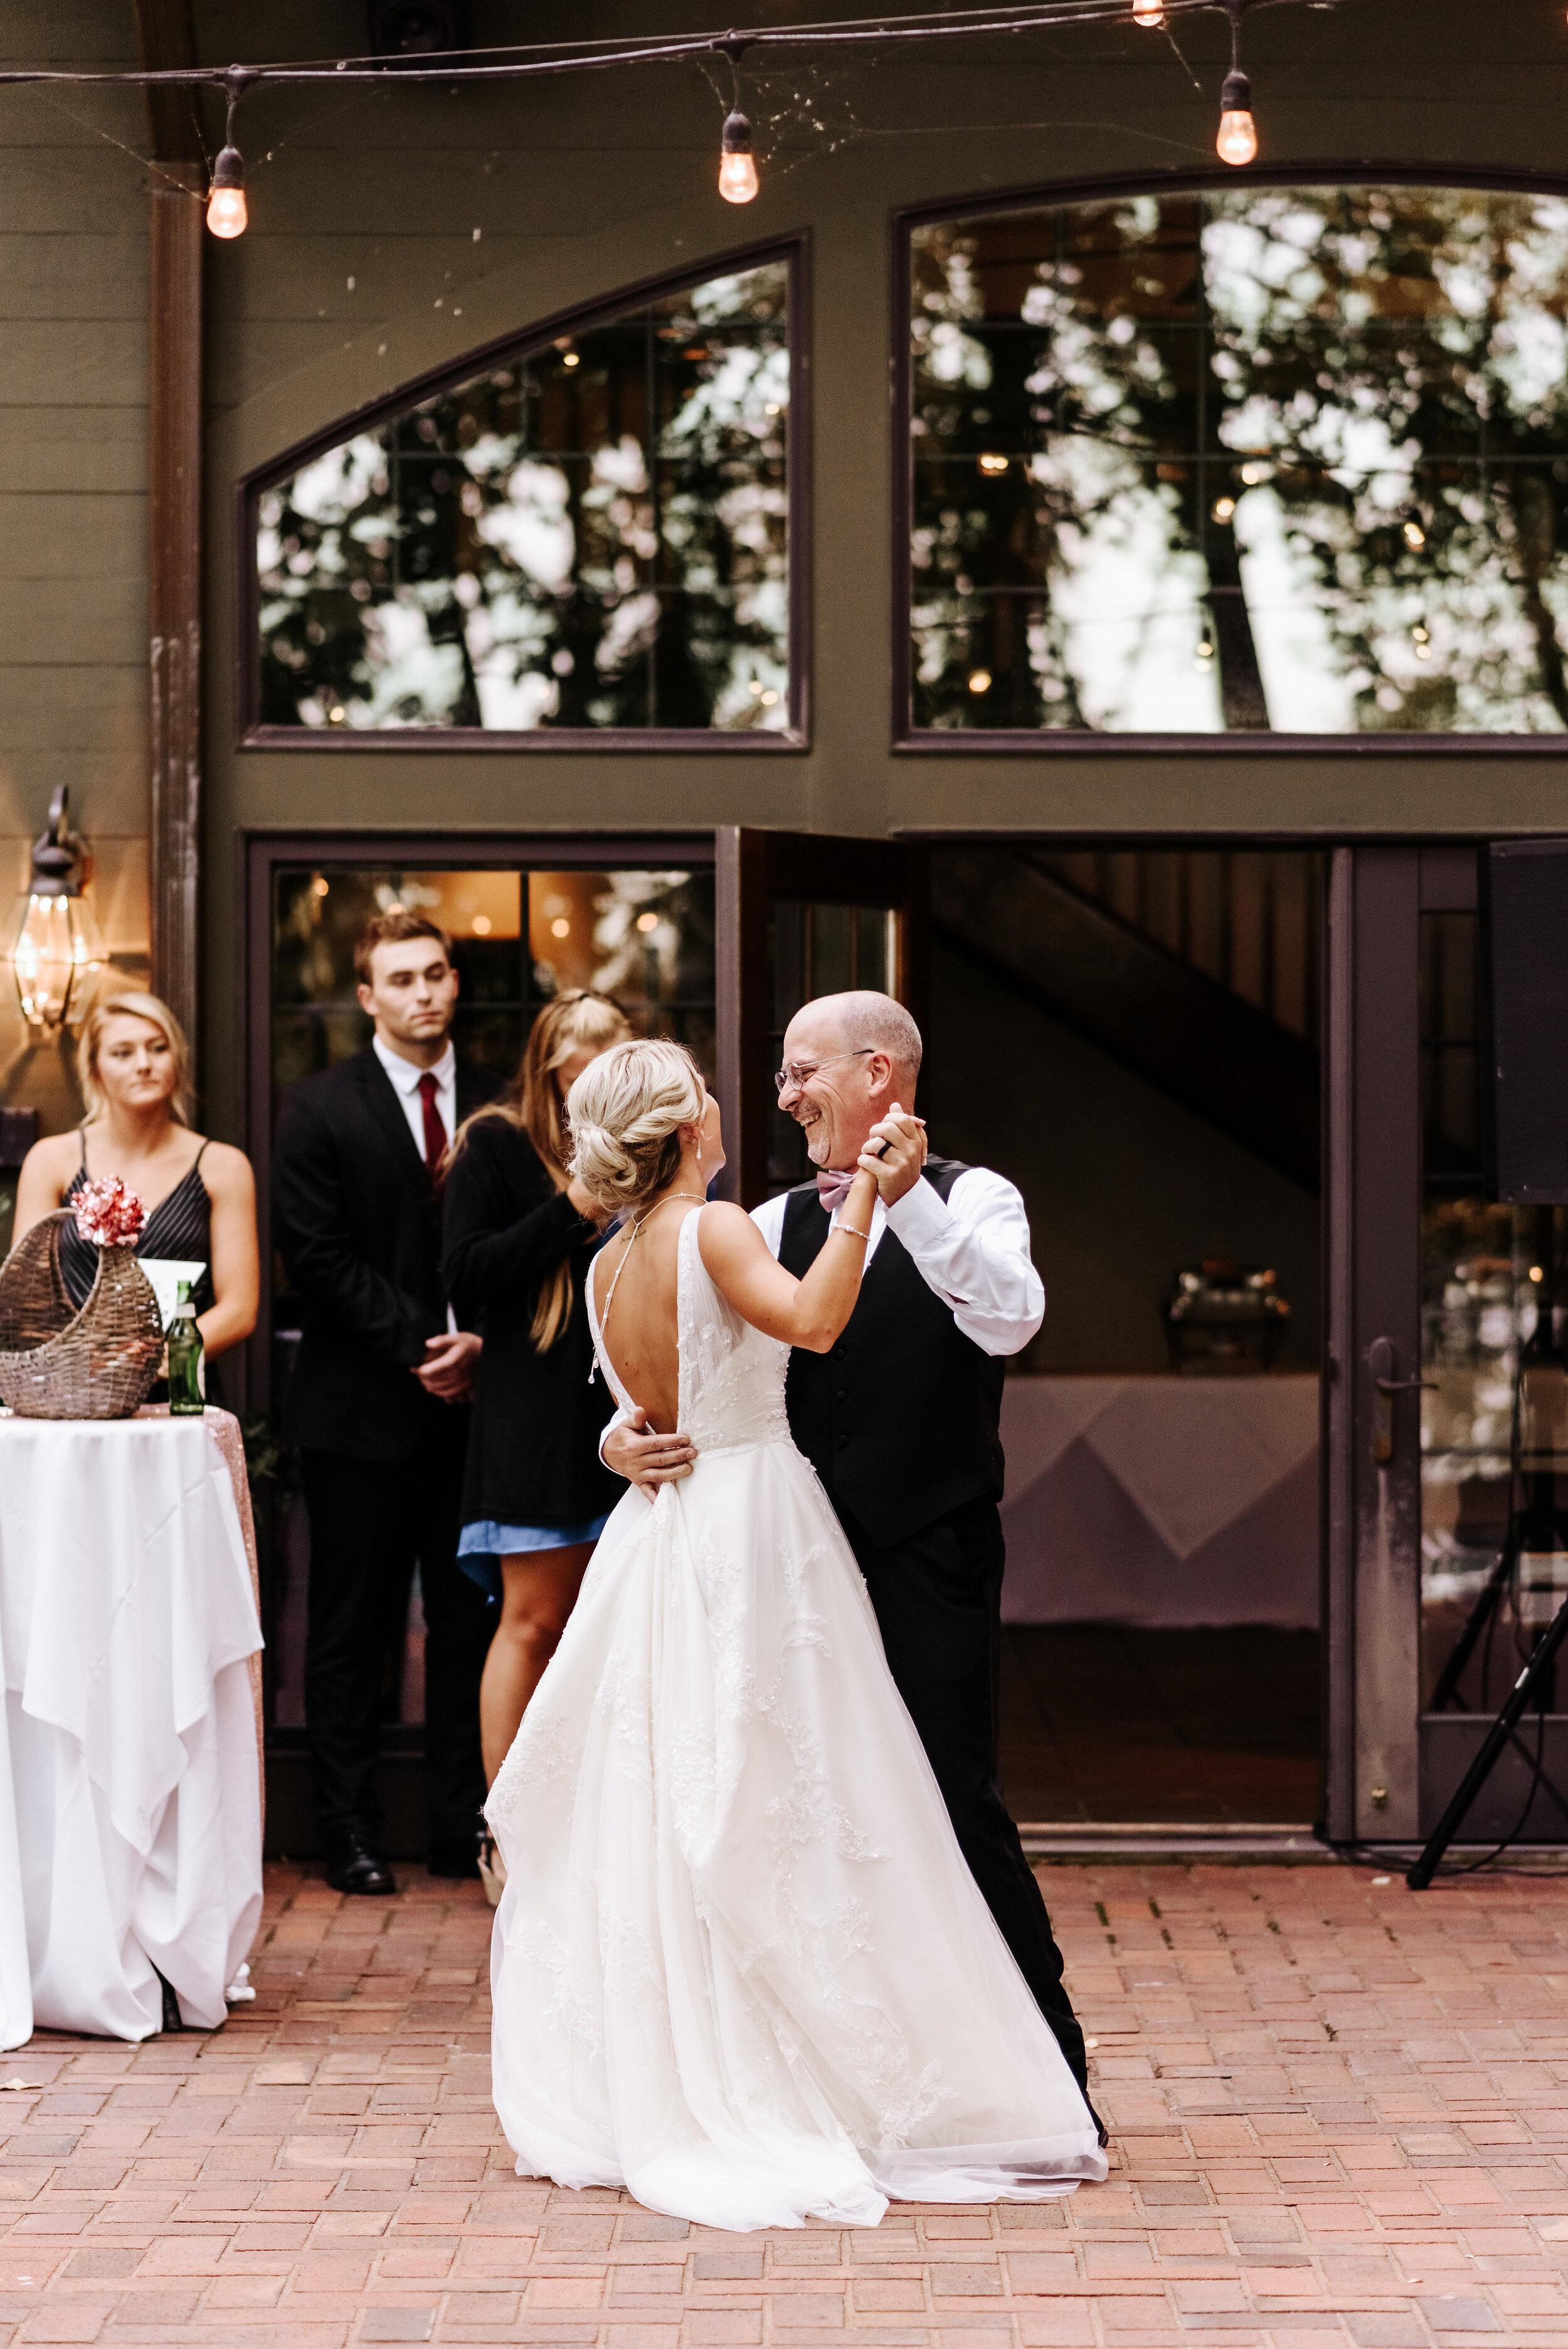 Emily_Mike_Wedding_Celebrations_at_the_Reservoir_Pool_Pavilion_Richmond_Virginia_Wedding_Photographer_Photography_by_V_75.jpg